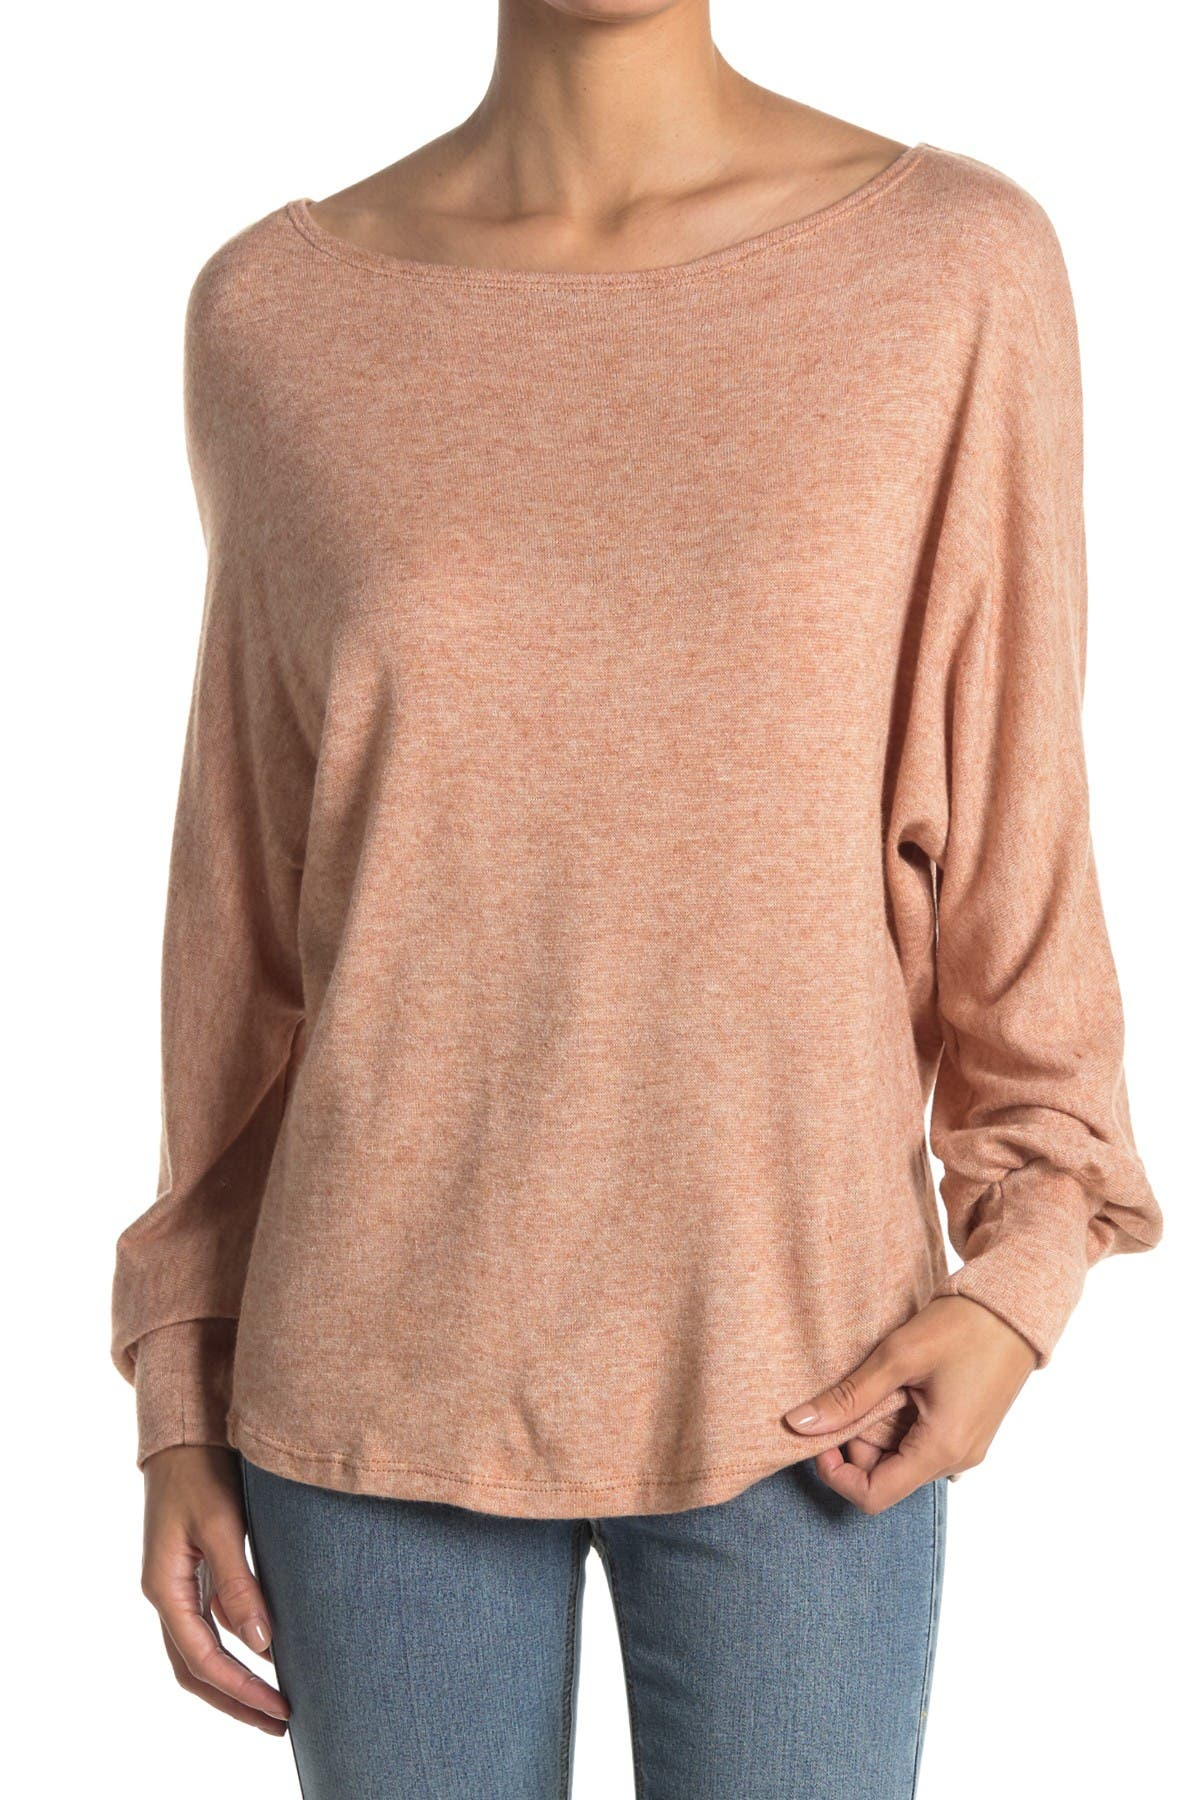 Image of Lush Boatneck Knit Sweater